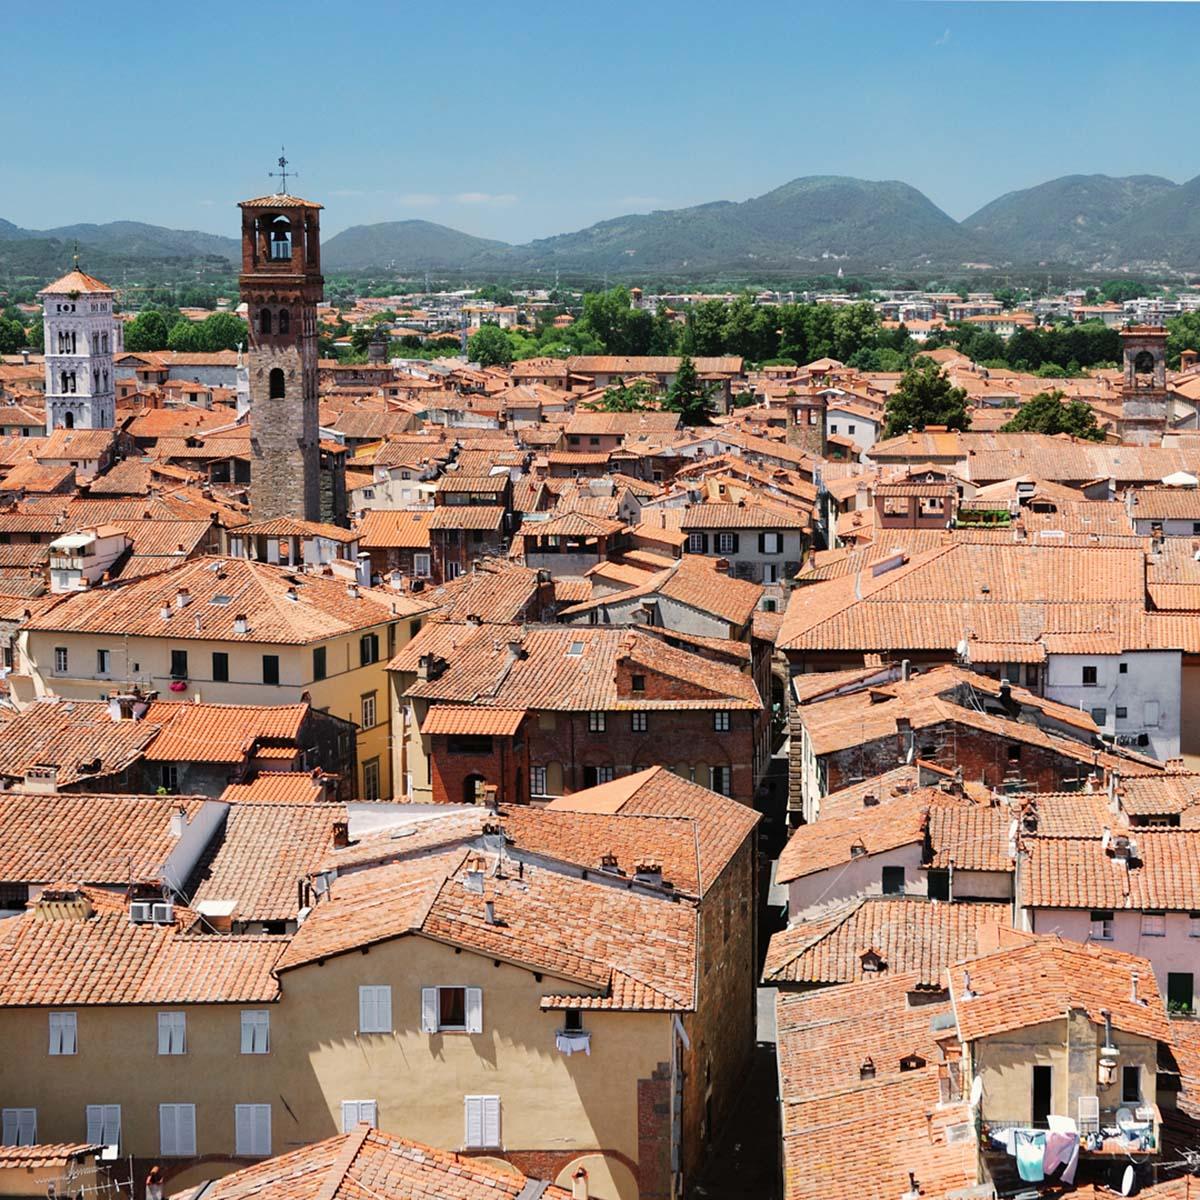 Matrimonio Cantina Toscana : Ristorante cantina toscana